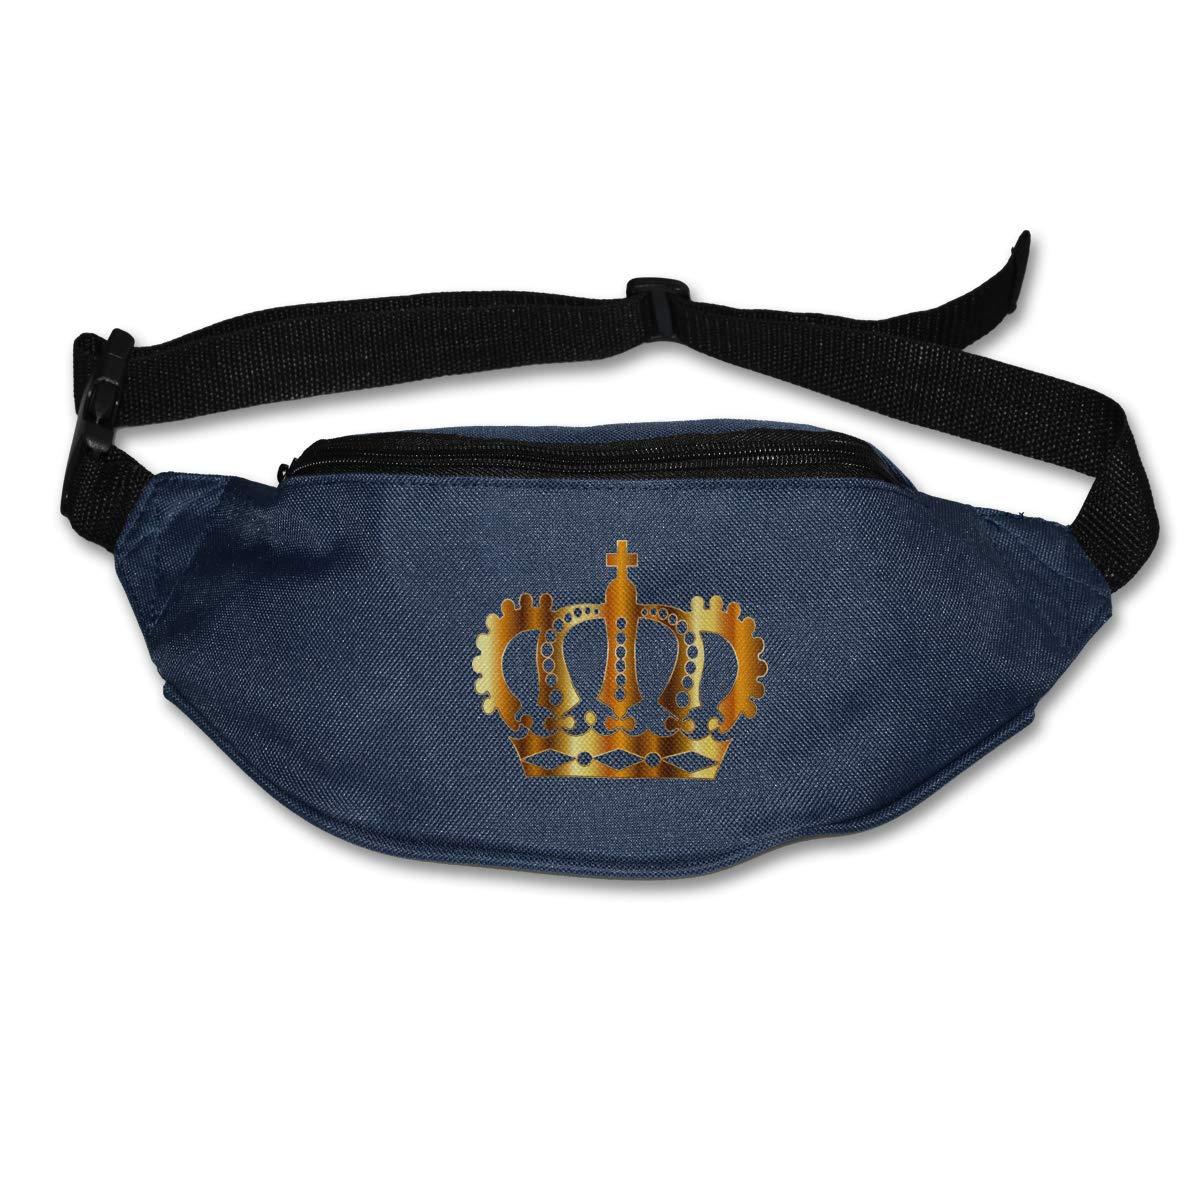 Gold German Imperial Crown Sport Waist Bag Fanny Pack Adjustable For Travel